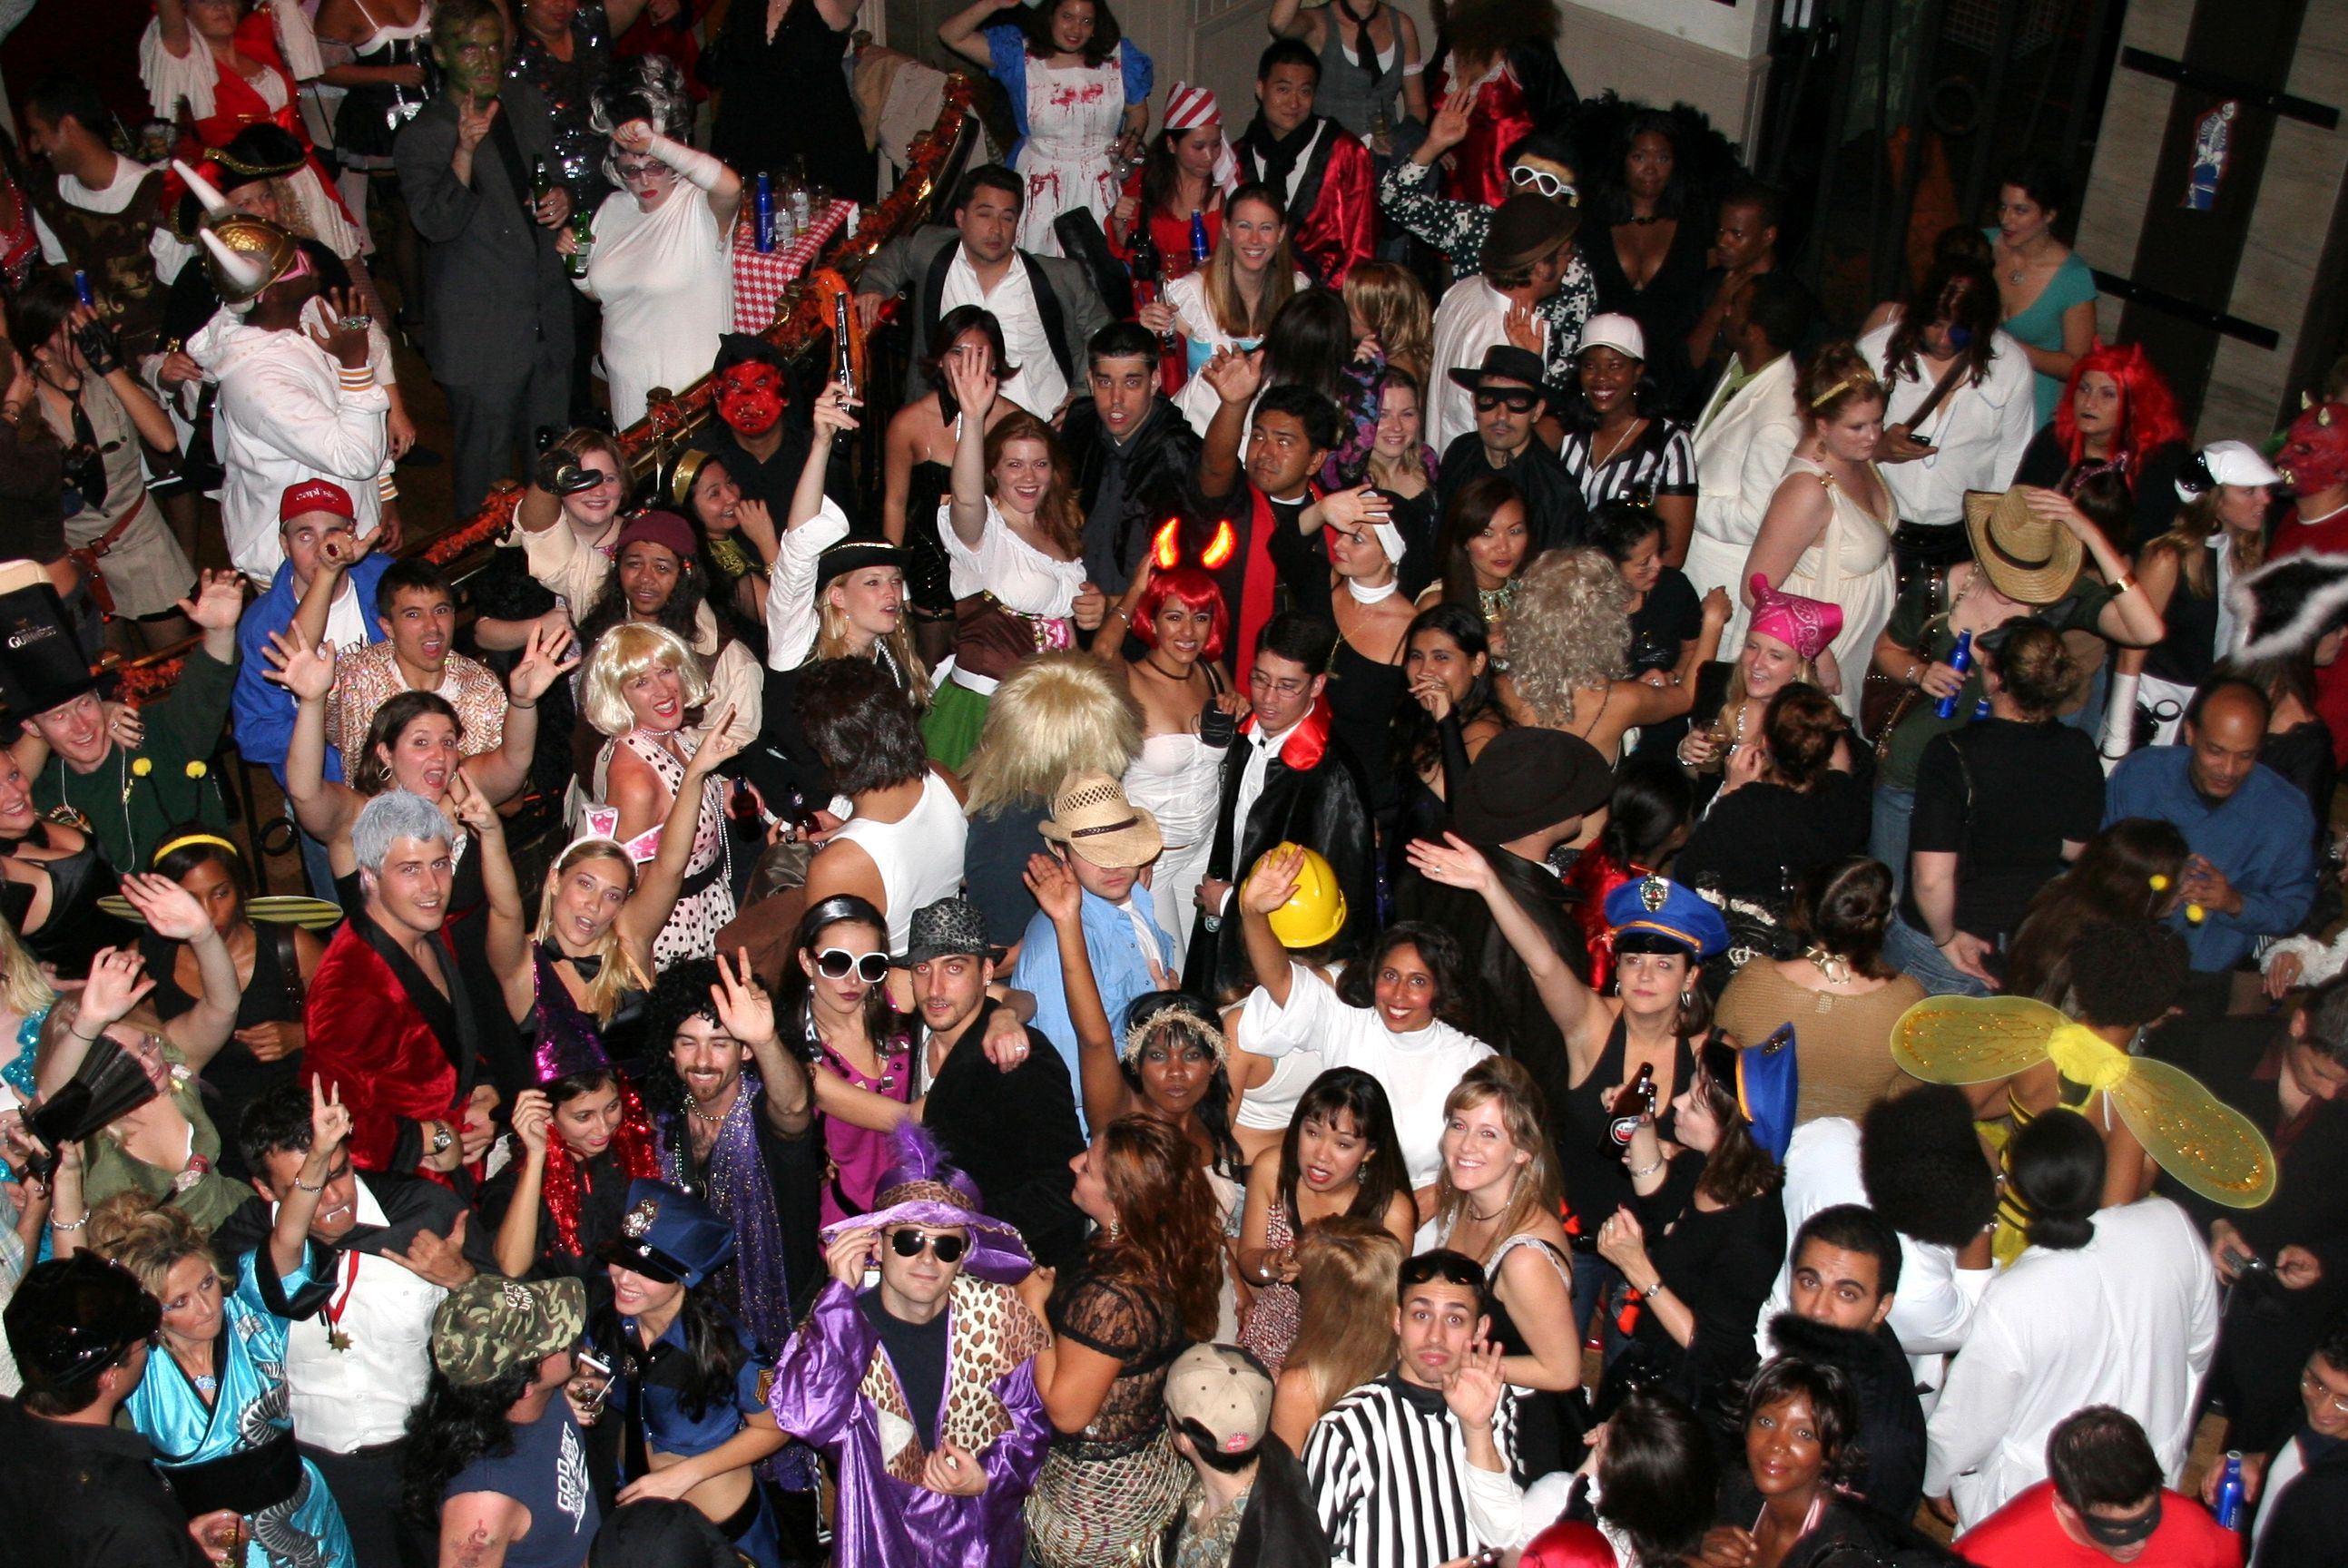 20 Years of Halloween in Washington D.C.